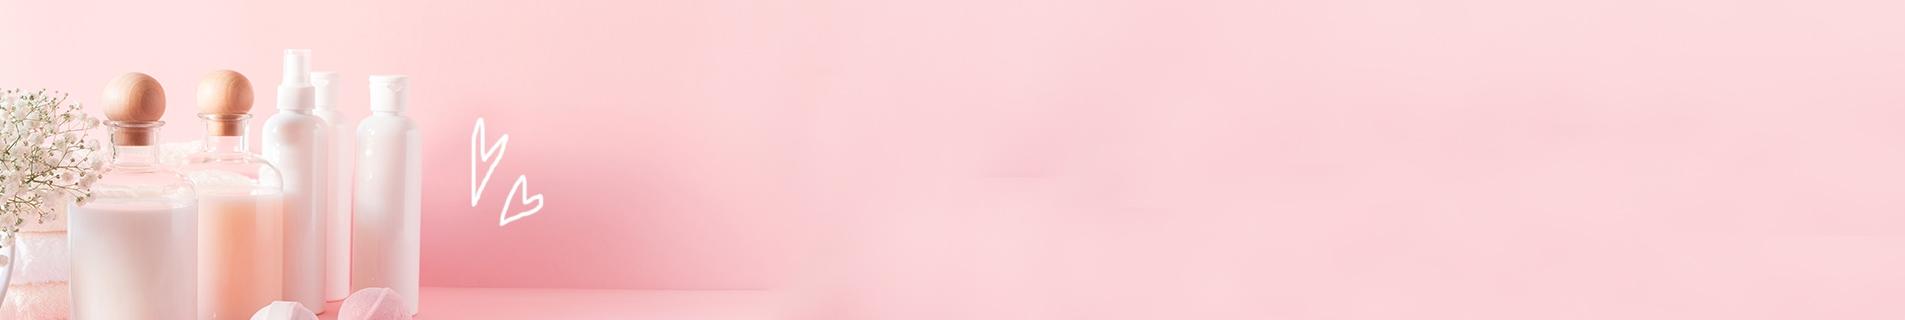 Promotions soins corps et cheveux | SAGA Cosmetics